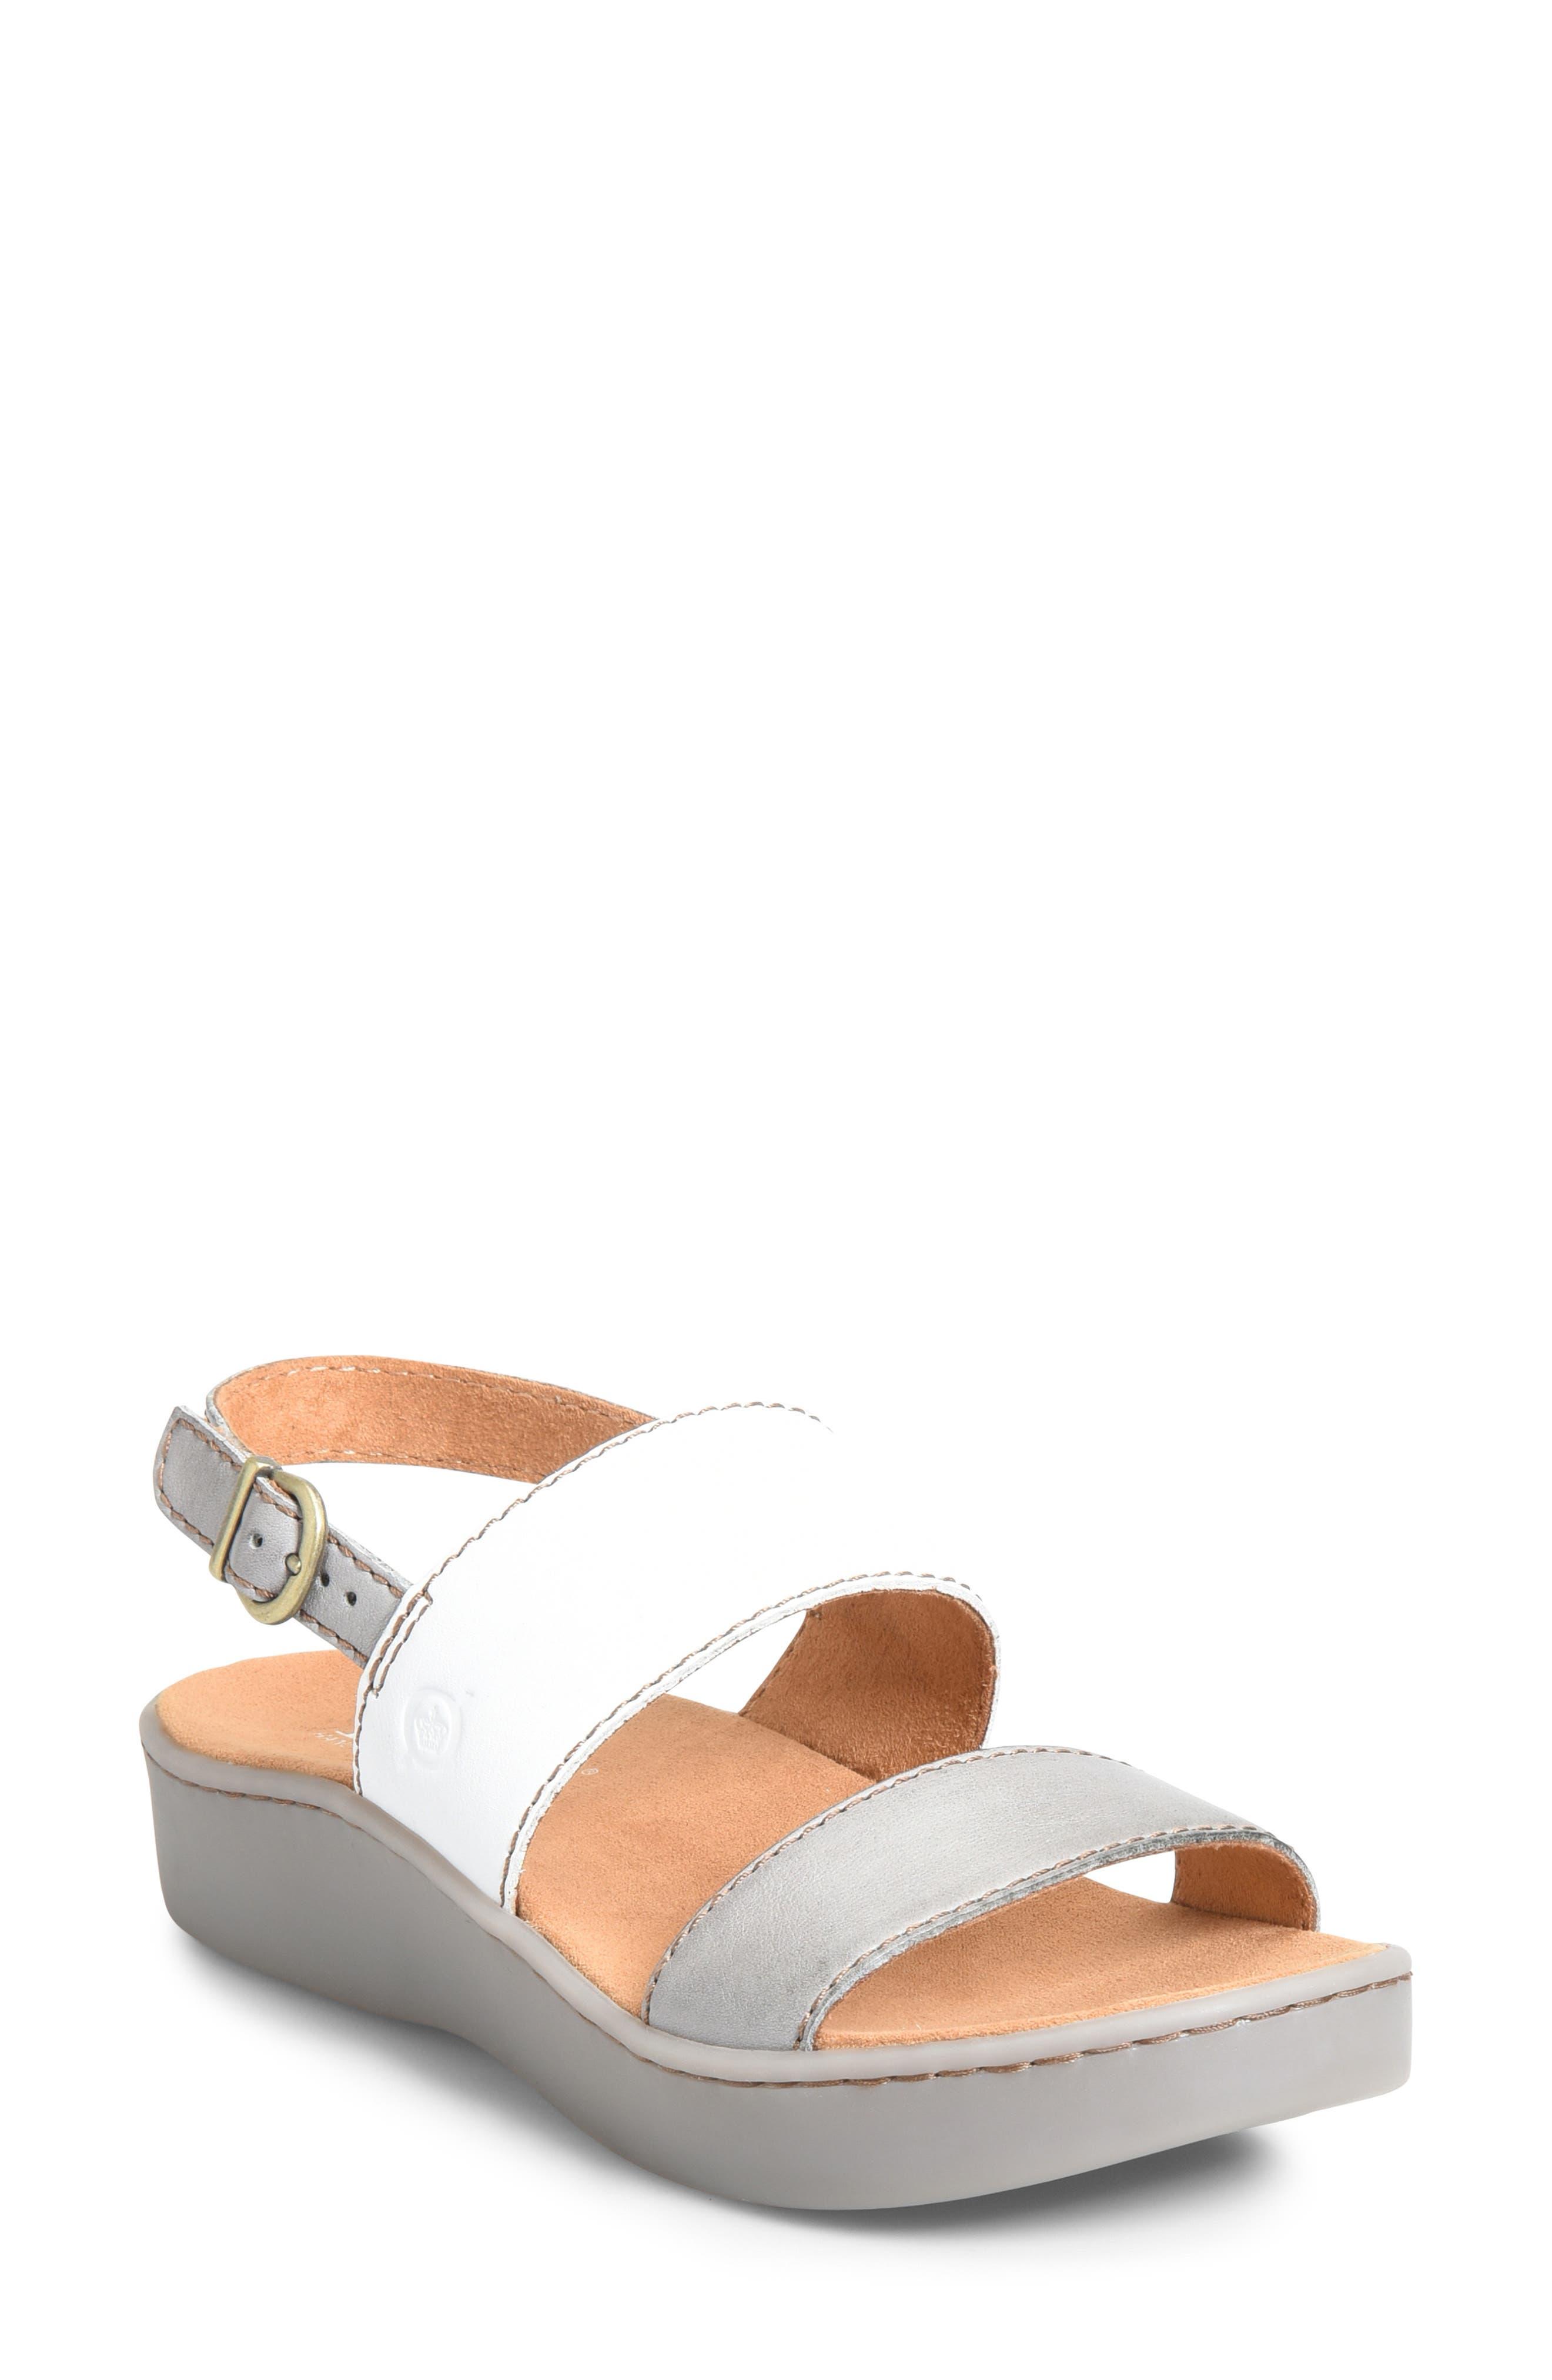 B?rn Oconee Platform Sandal, Grey